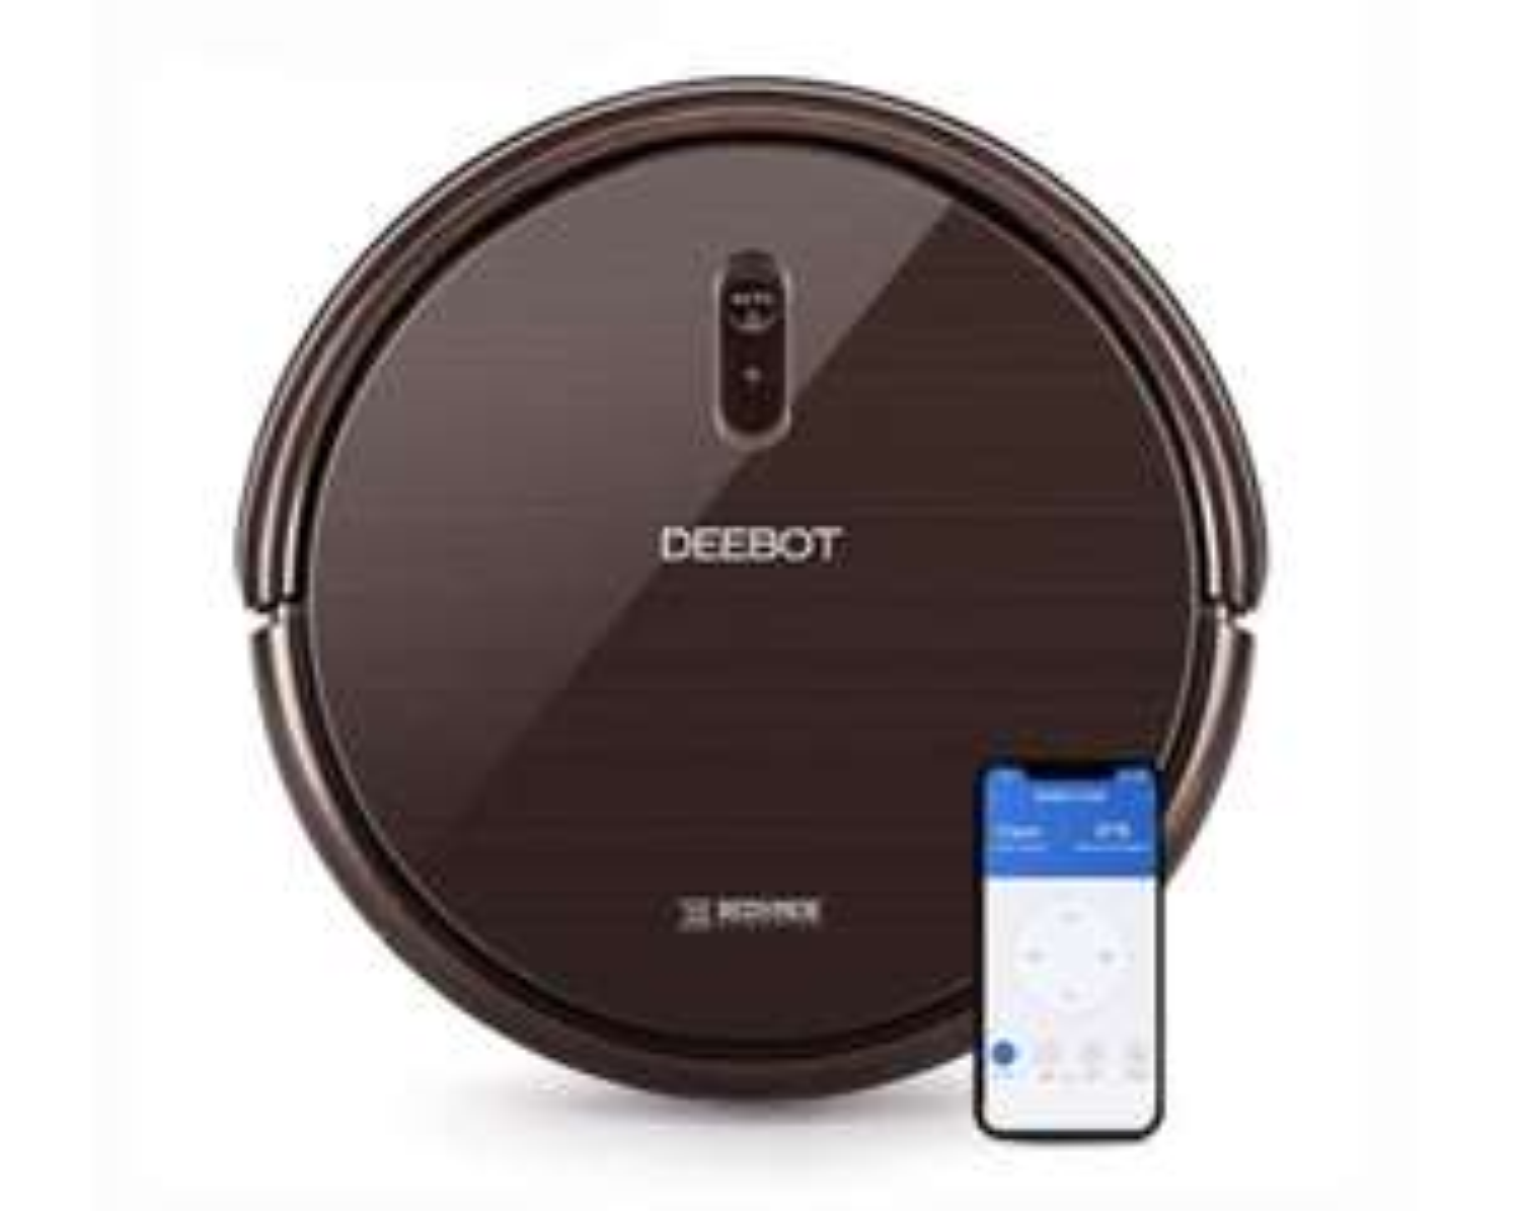 Ecovacs Deebot N79S Saugroboter (gebraucht - sehr gut) @ Amazon Warehouse Deals [Neupreis ab 169,-€ (idealo)]